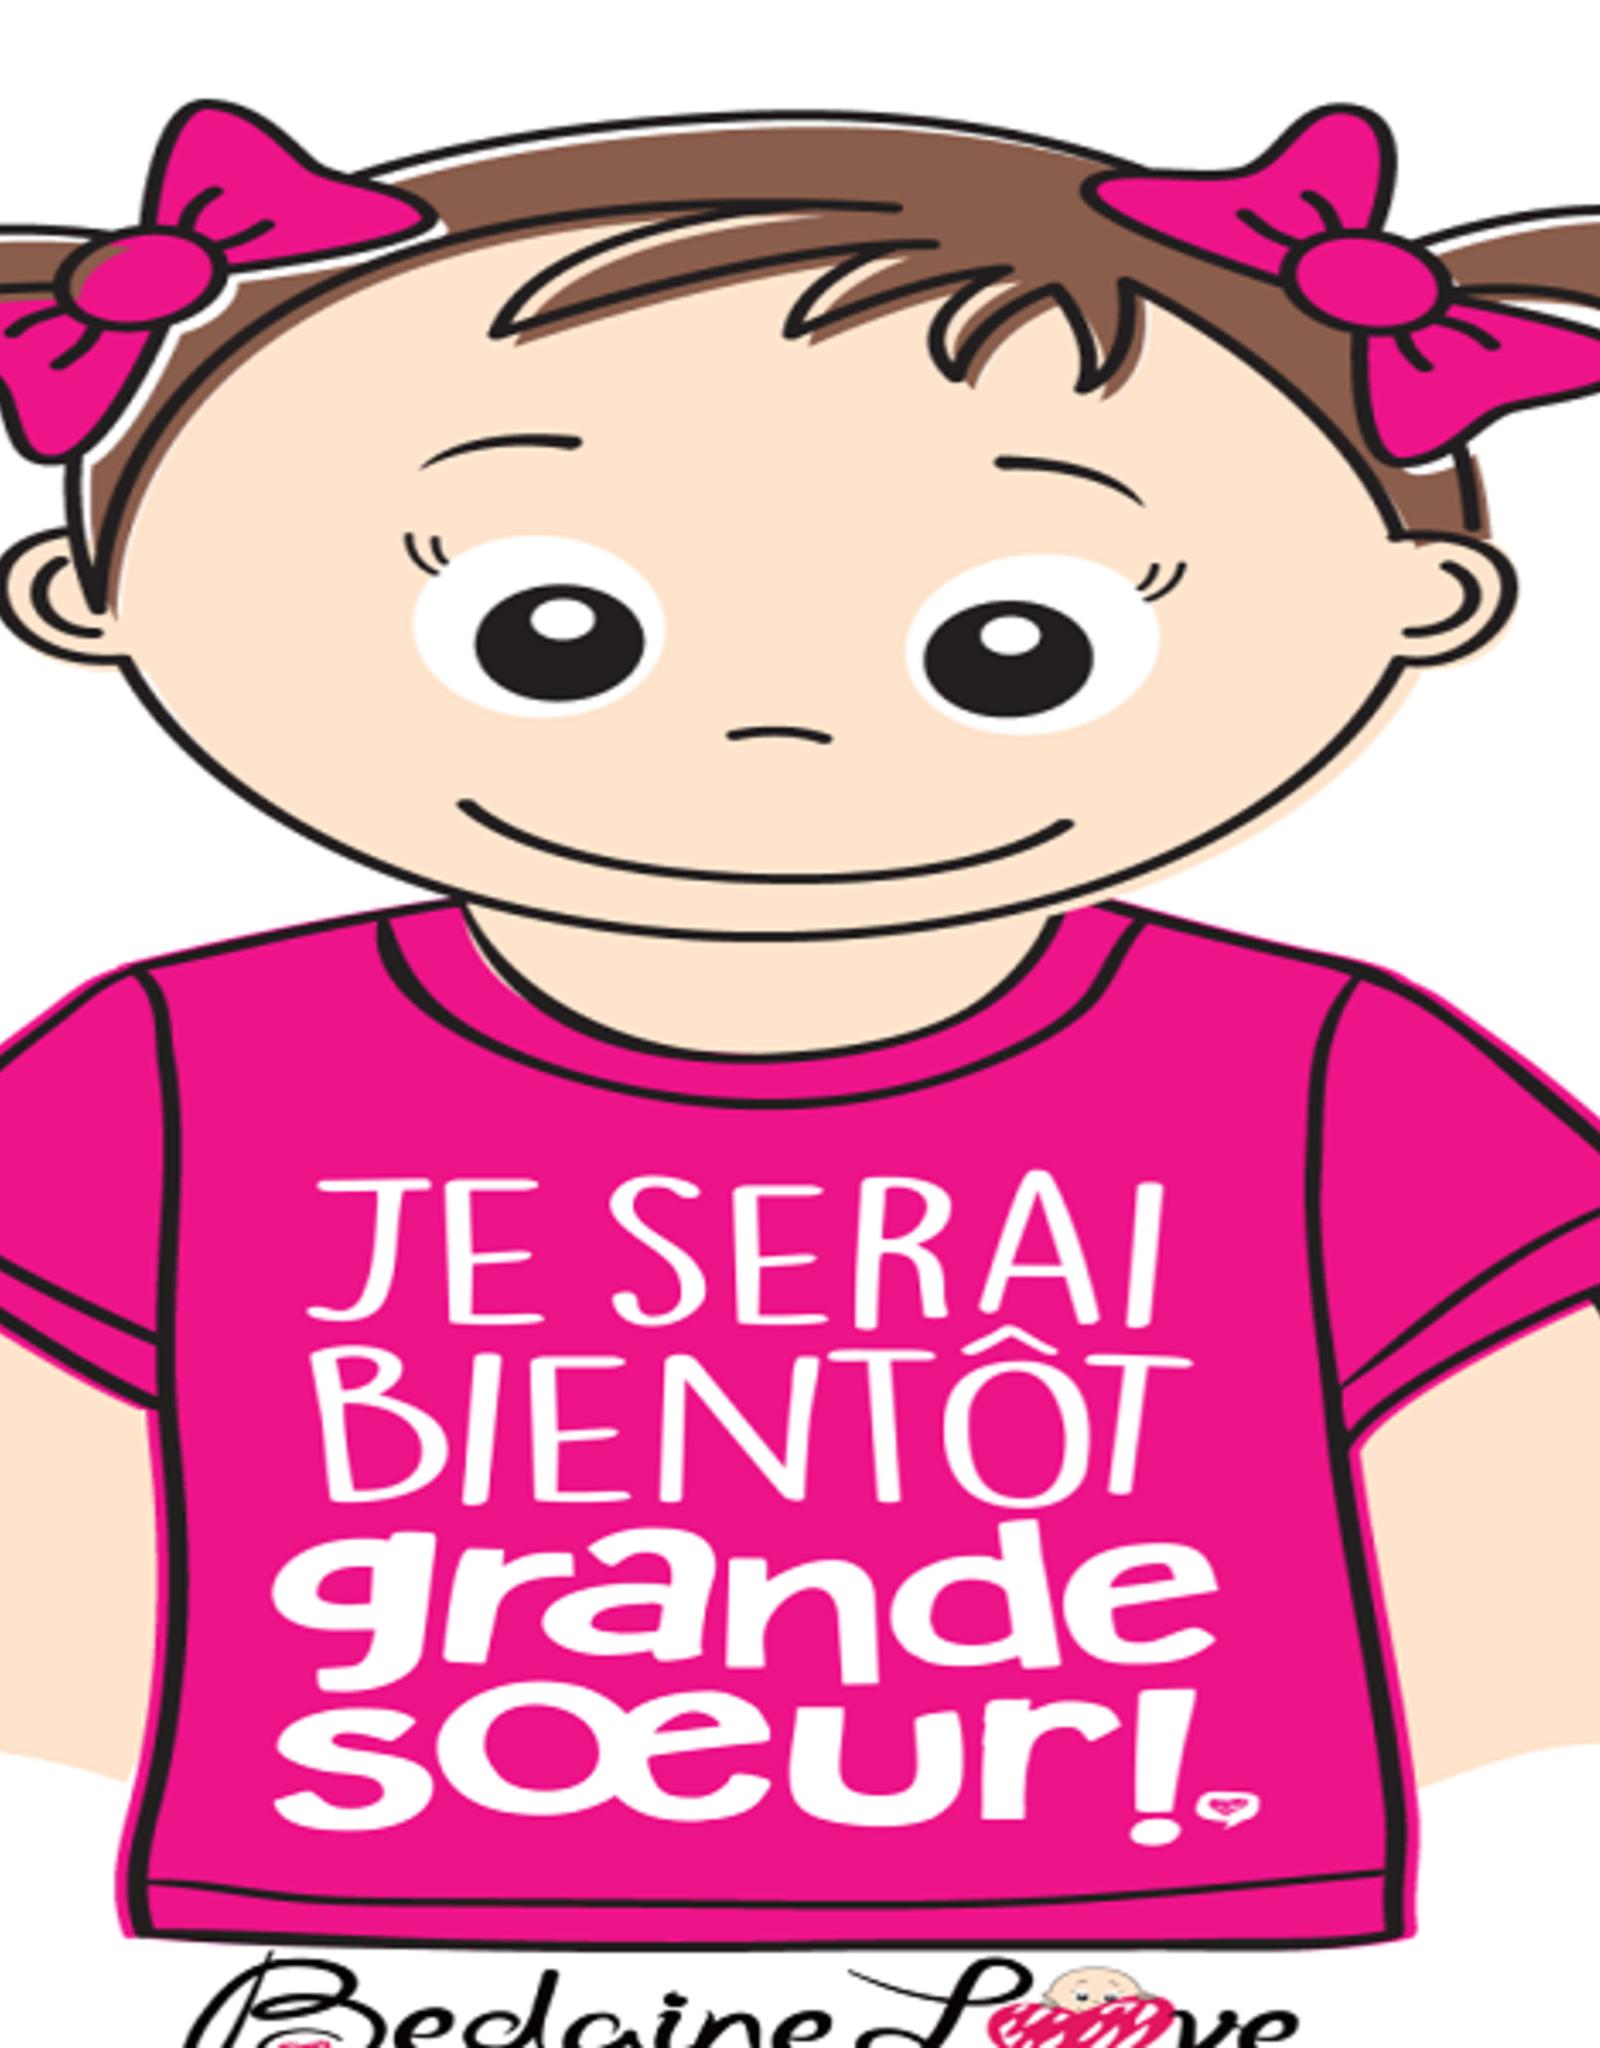 Bedaine love Je serai bientôt grande soeur rose